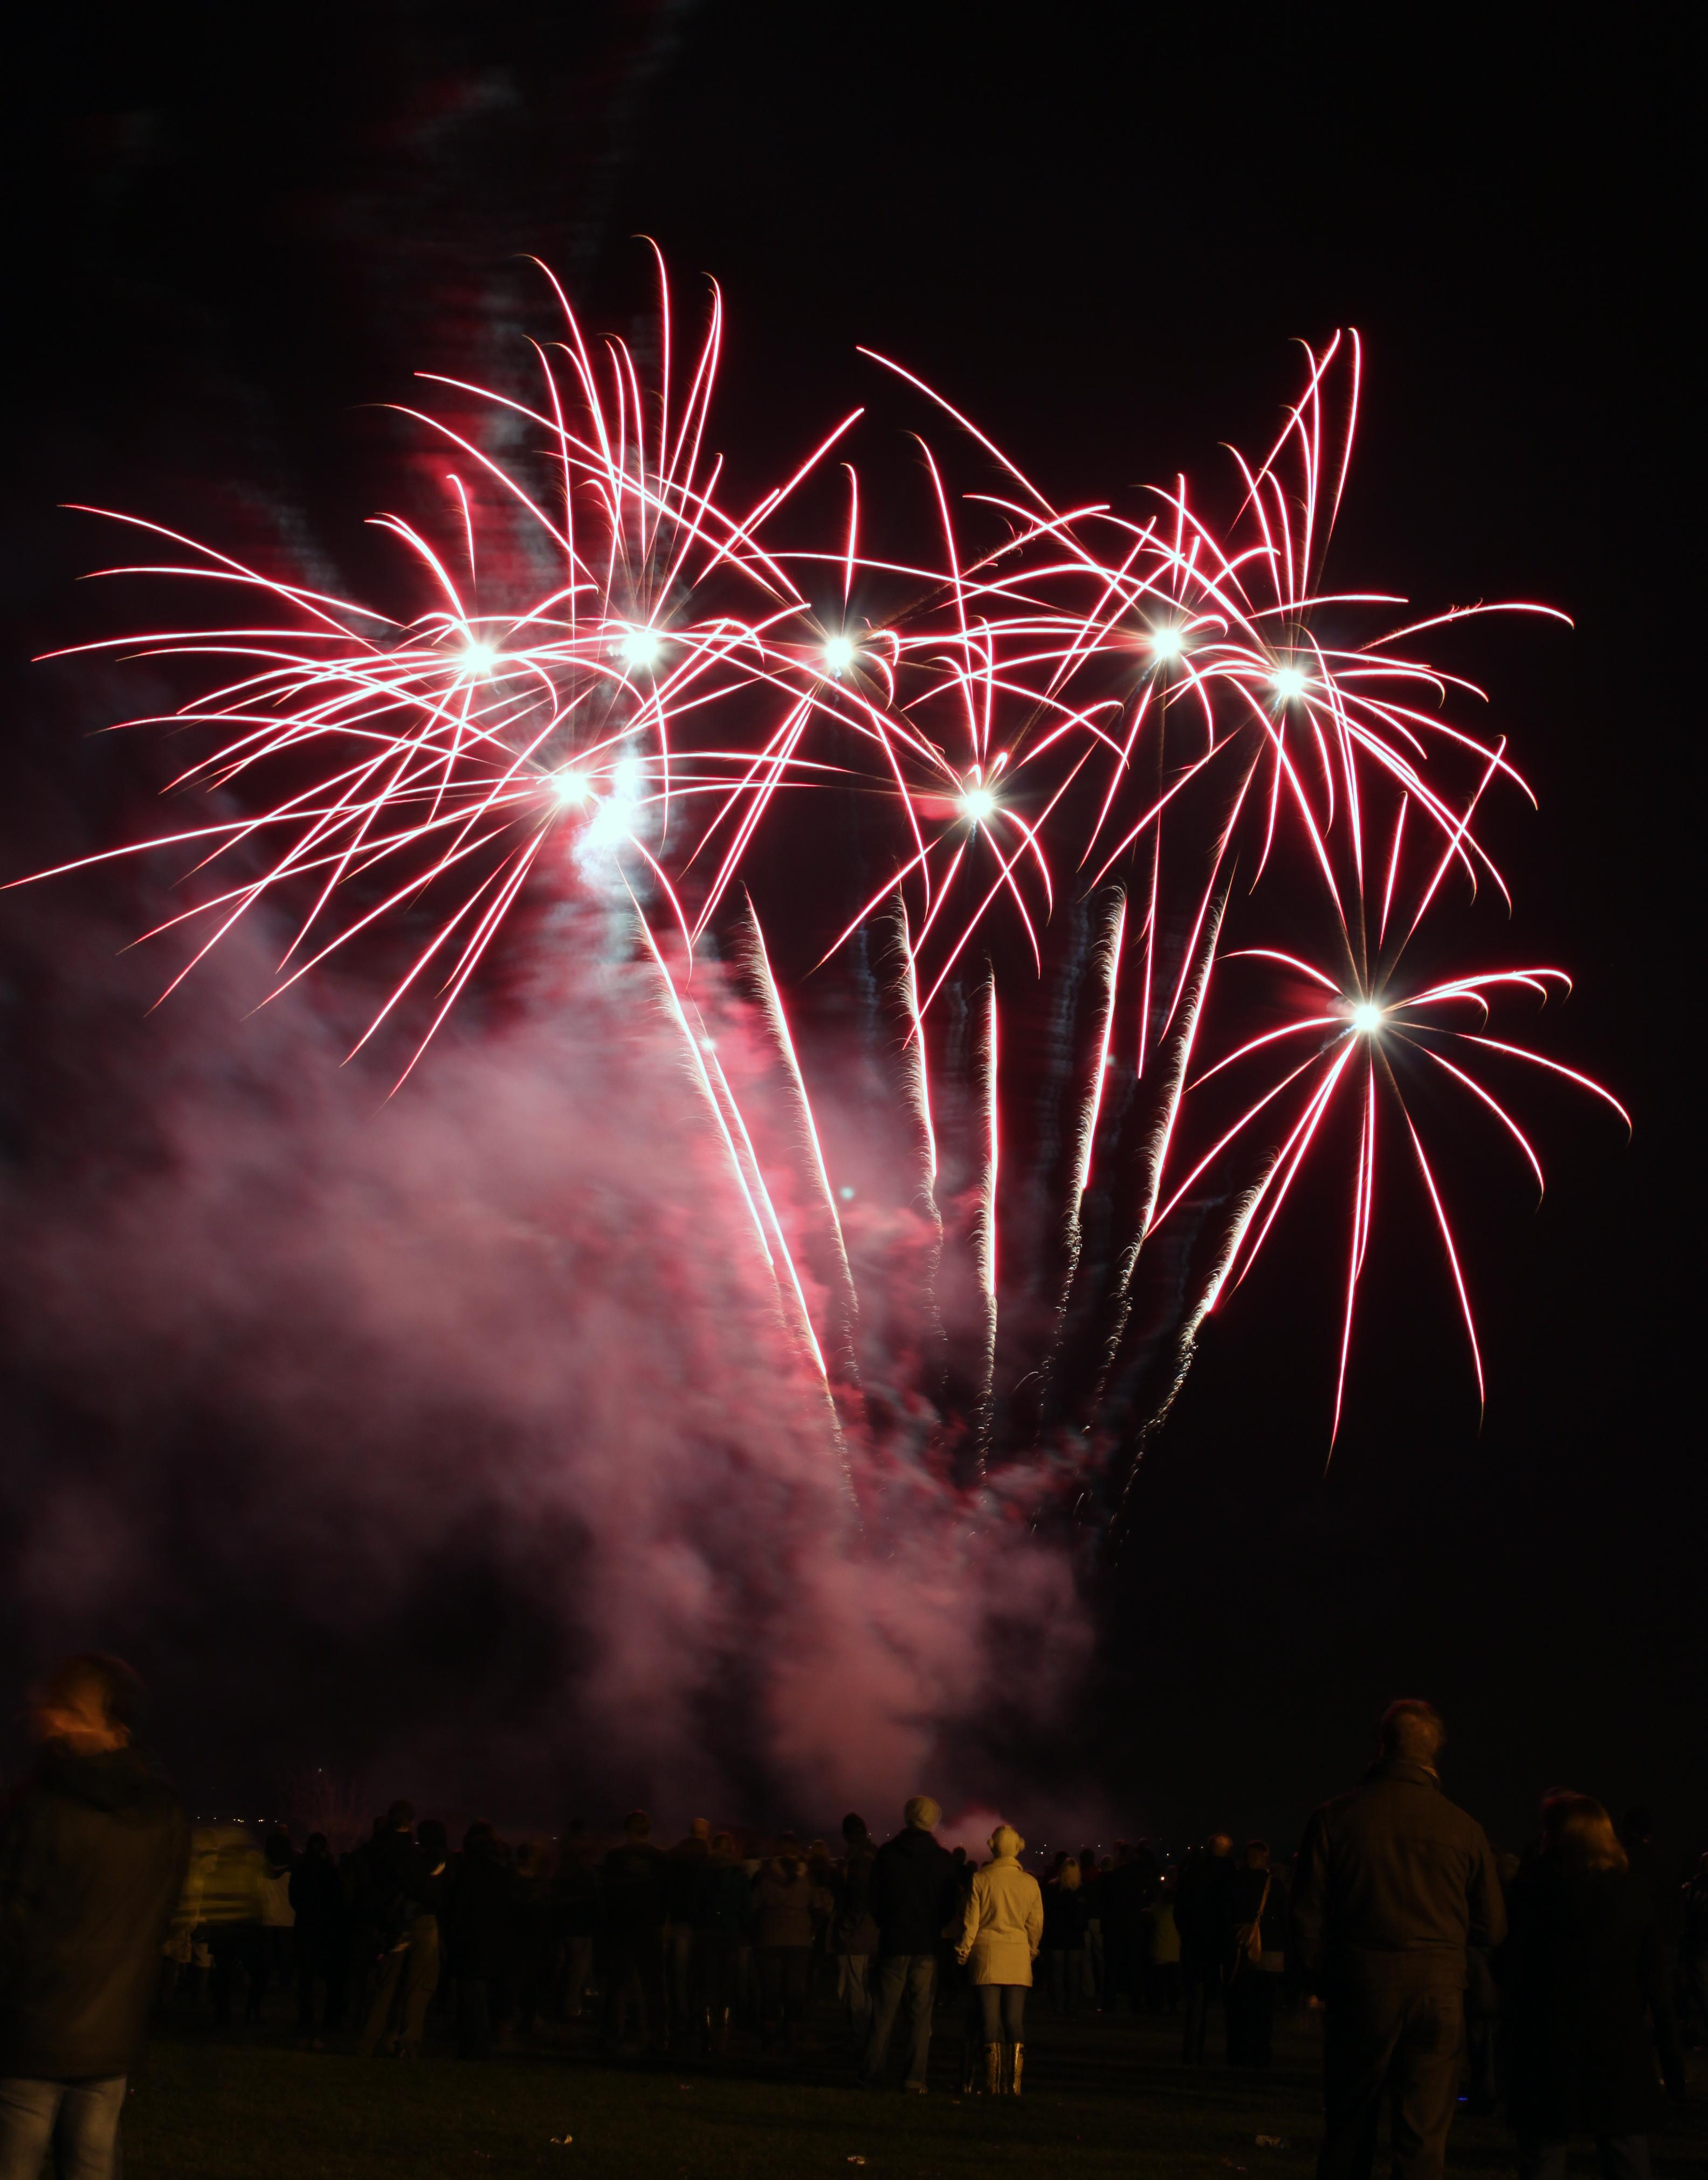 Free photo: Fireworks Display - Night, New year's eve, New year